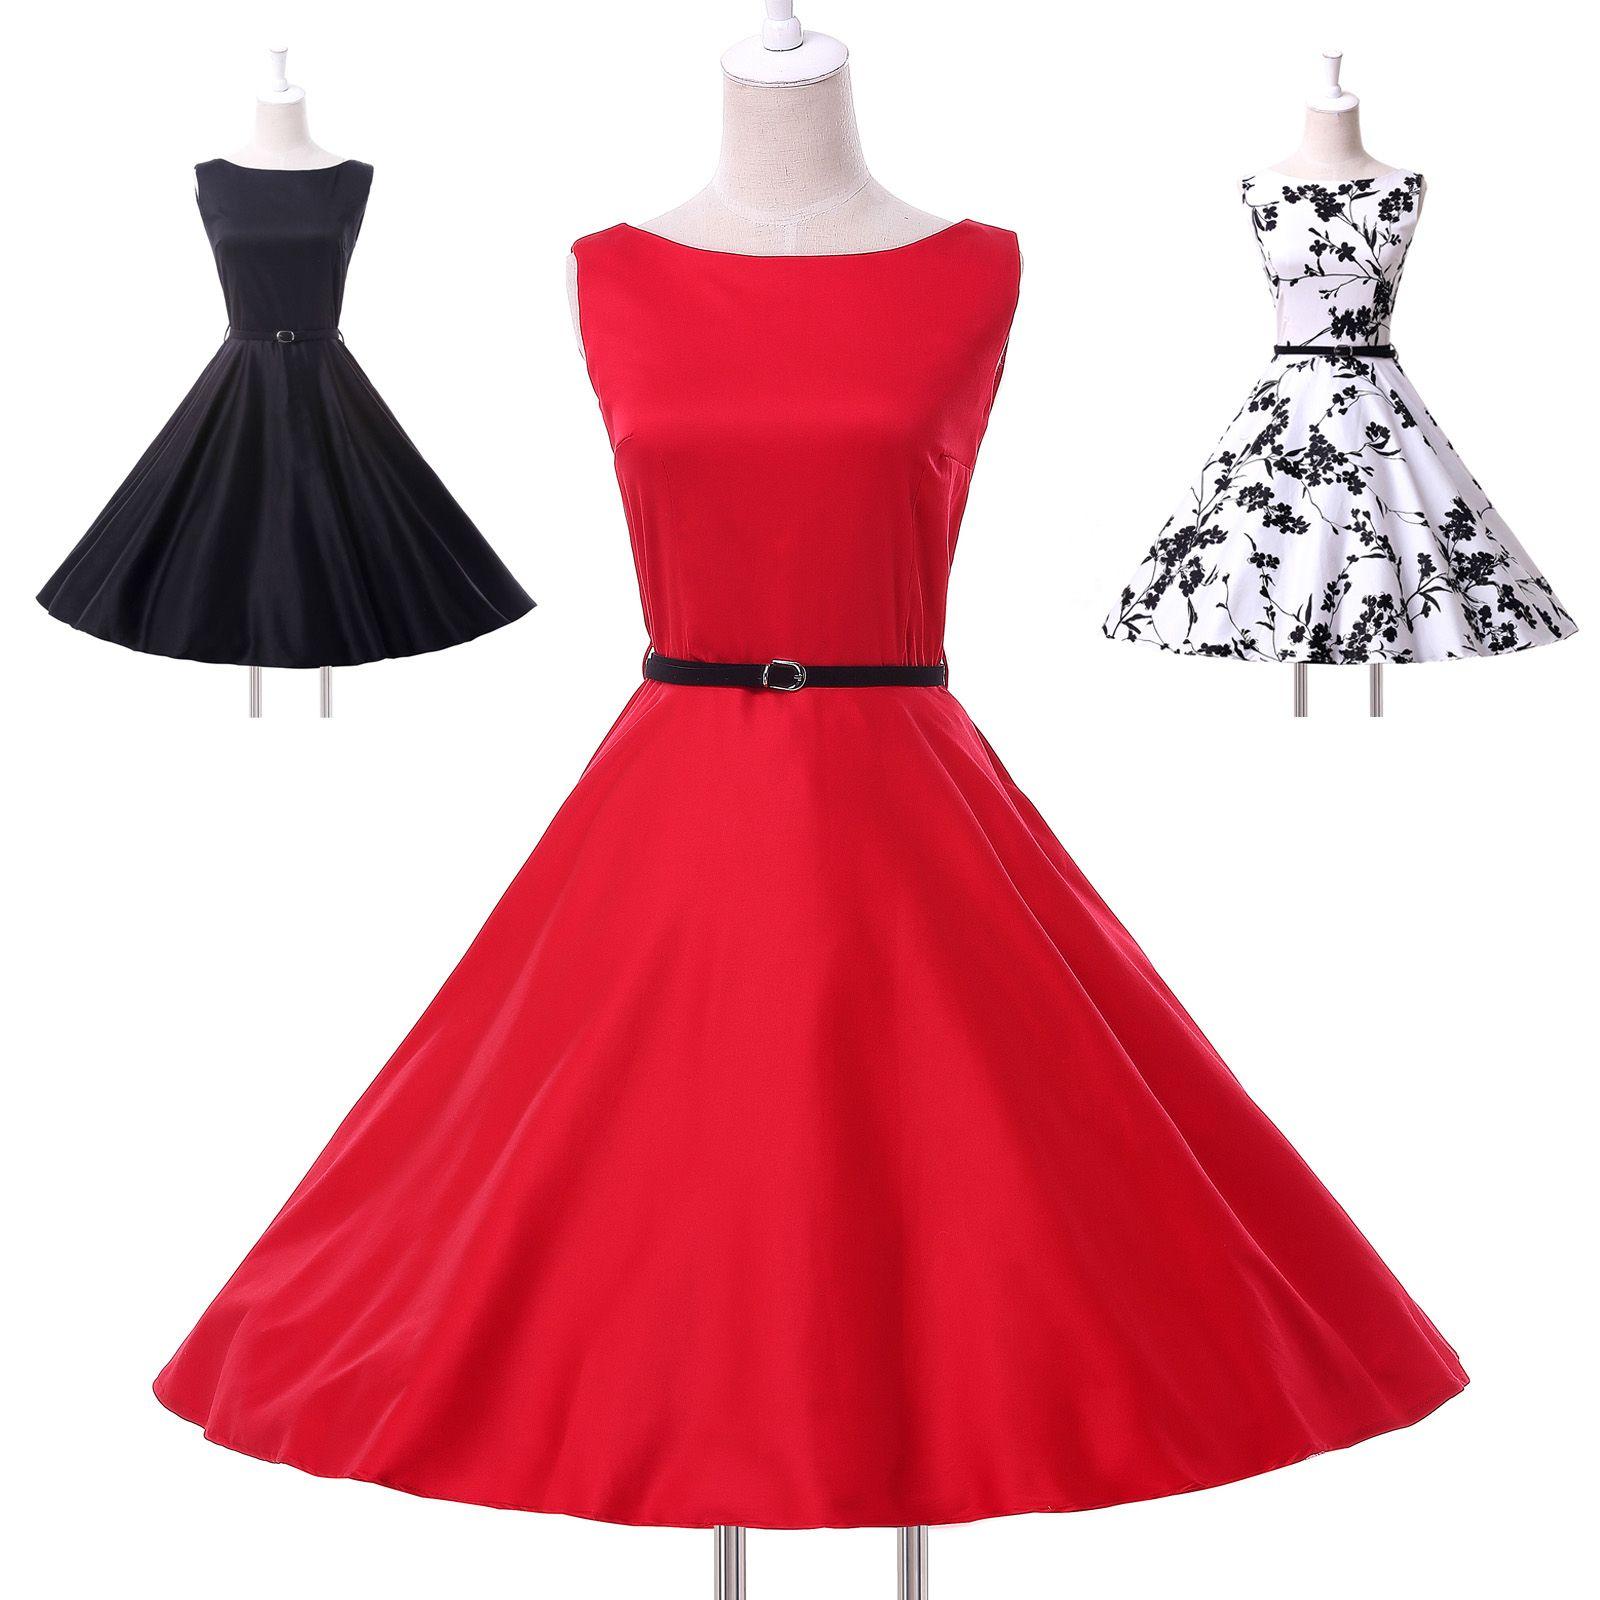 New Arrival Polka Dot Rockabilly Vintage Swing Work Evening Dress ...